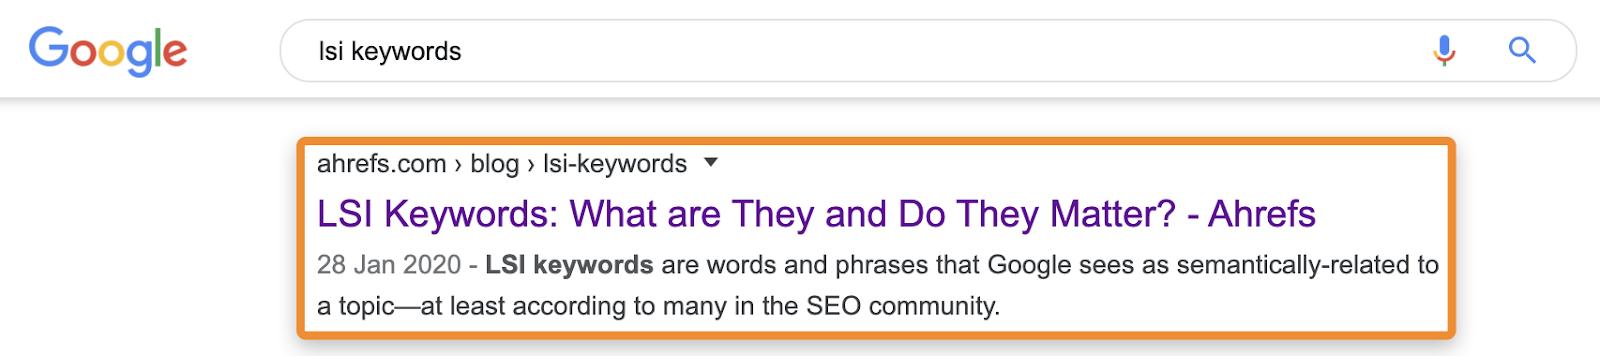 5 lsi keywords